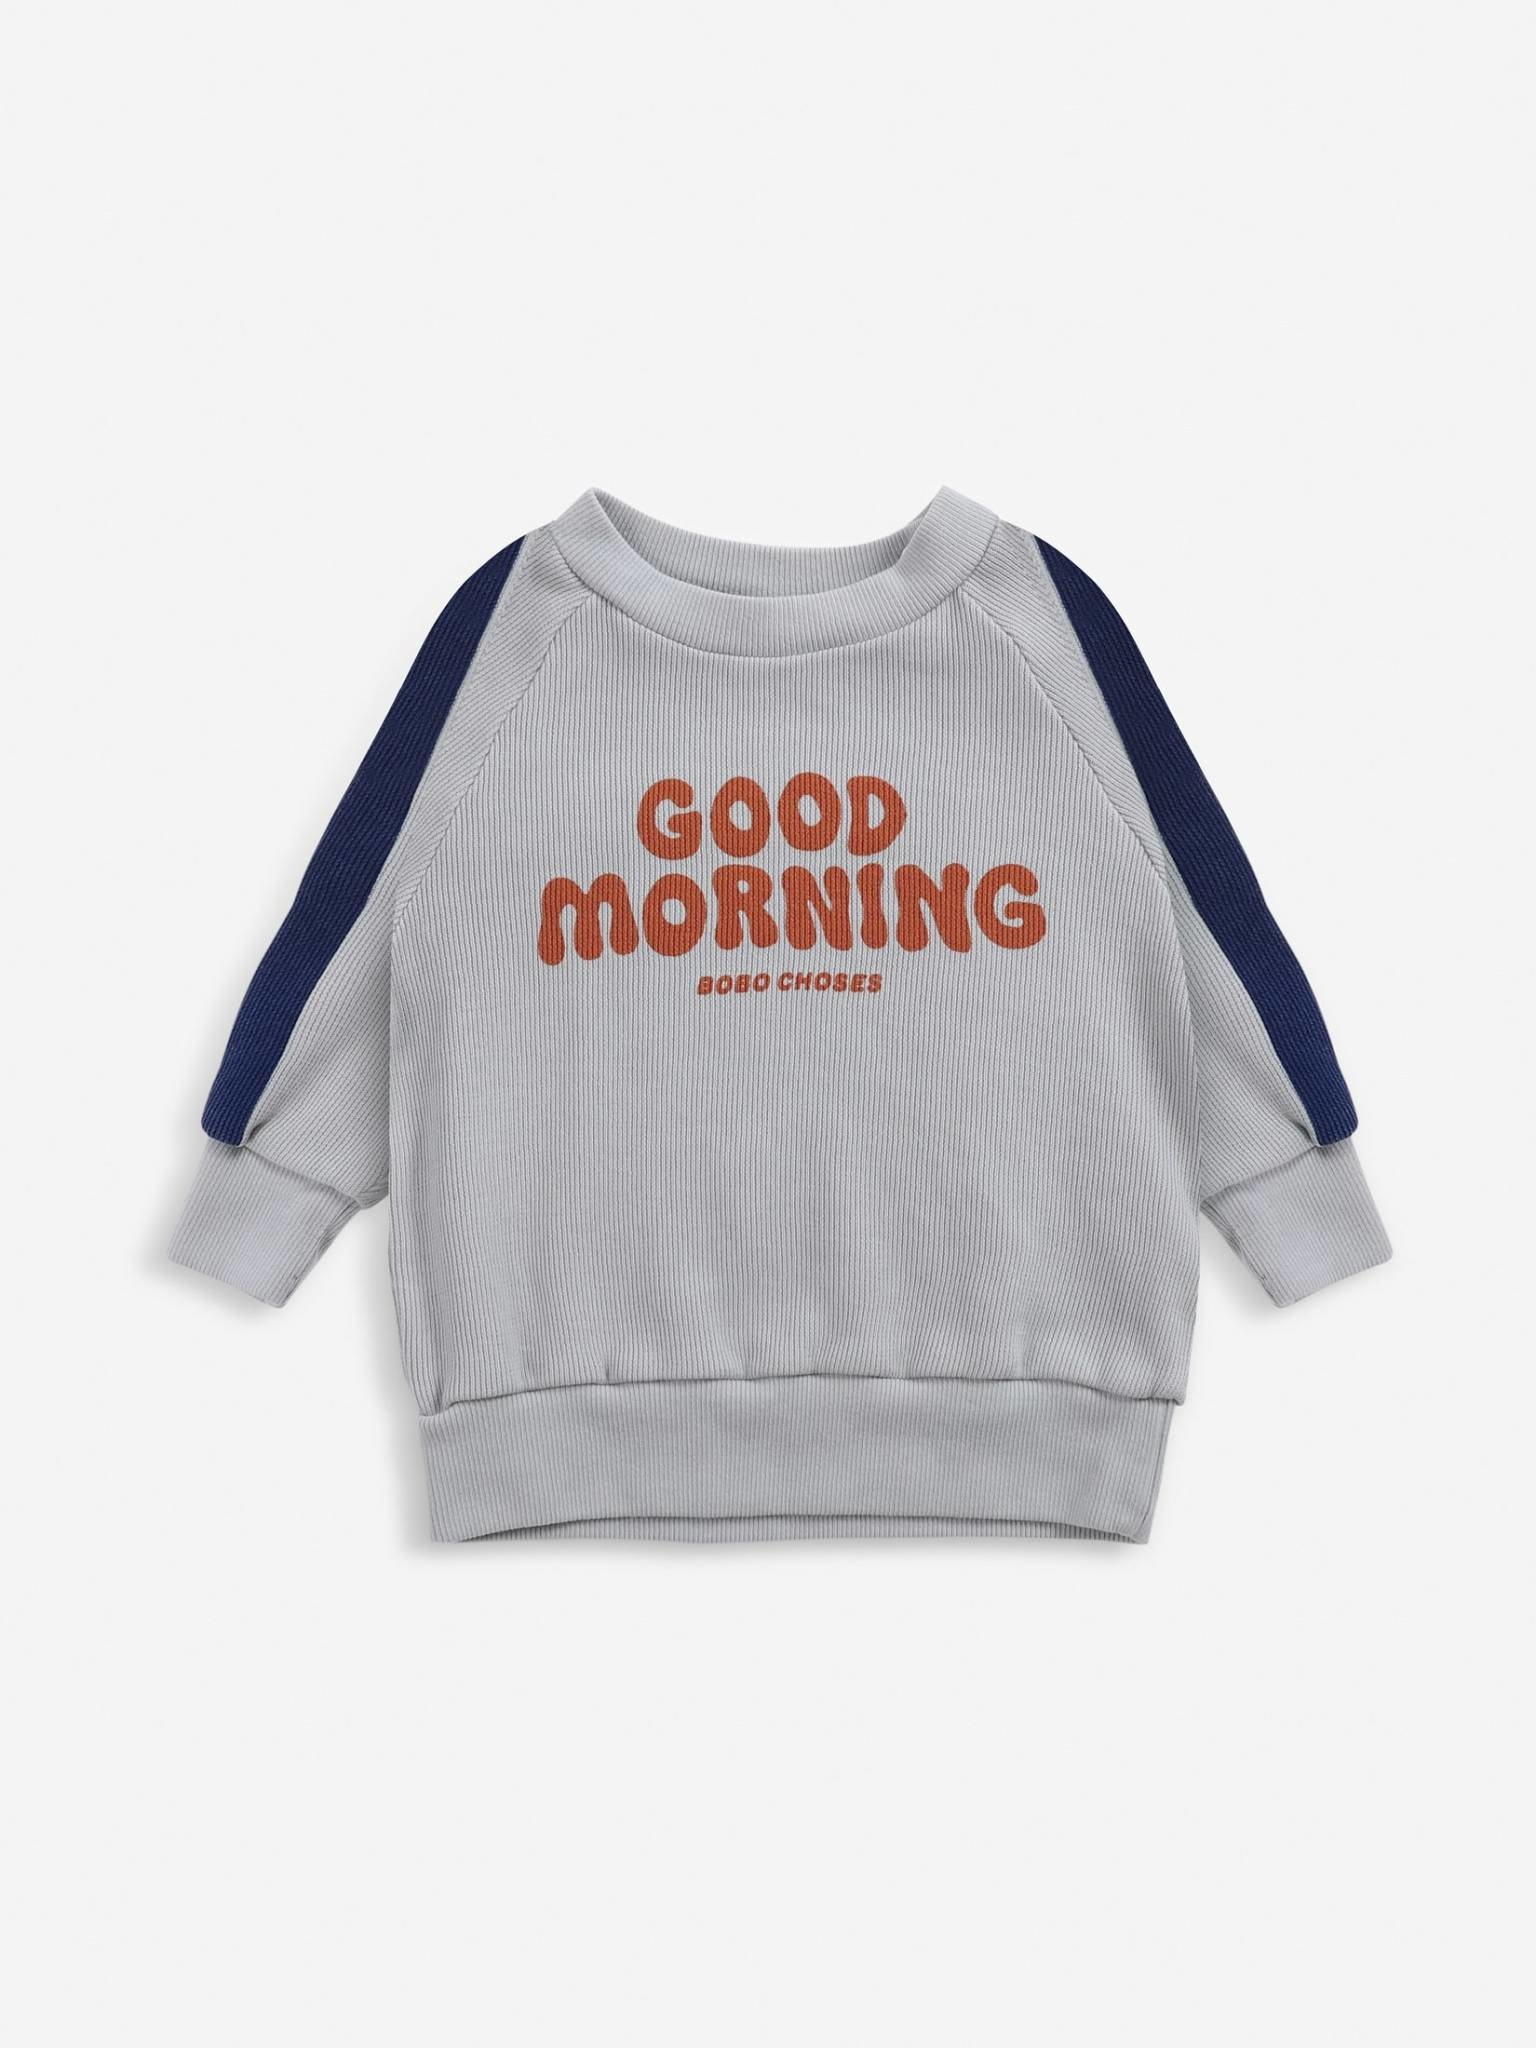 Good morning sweatshirt-1